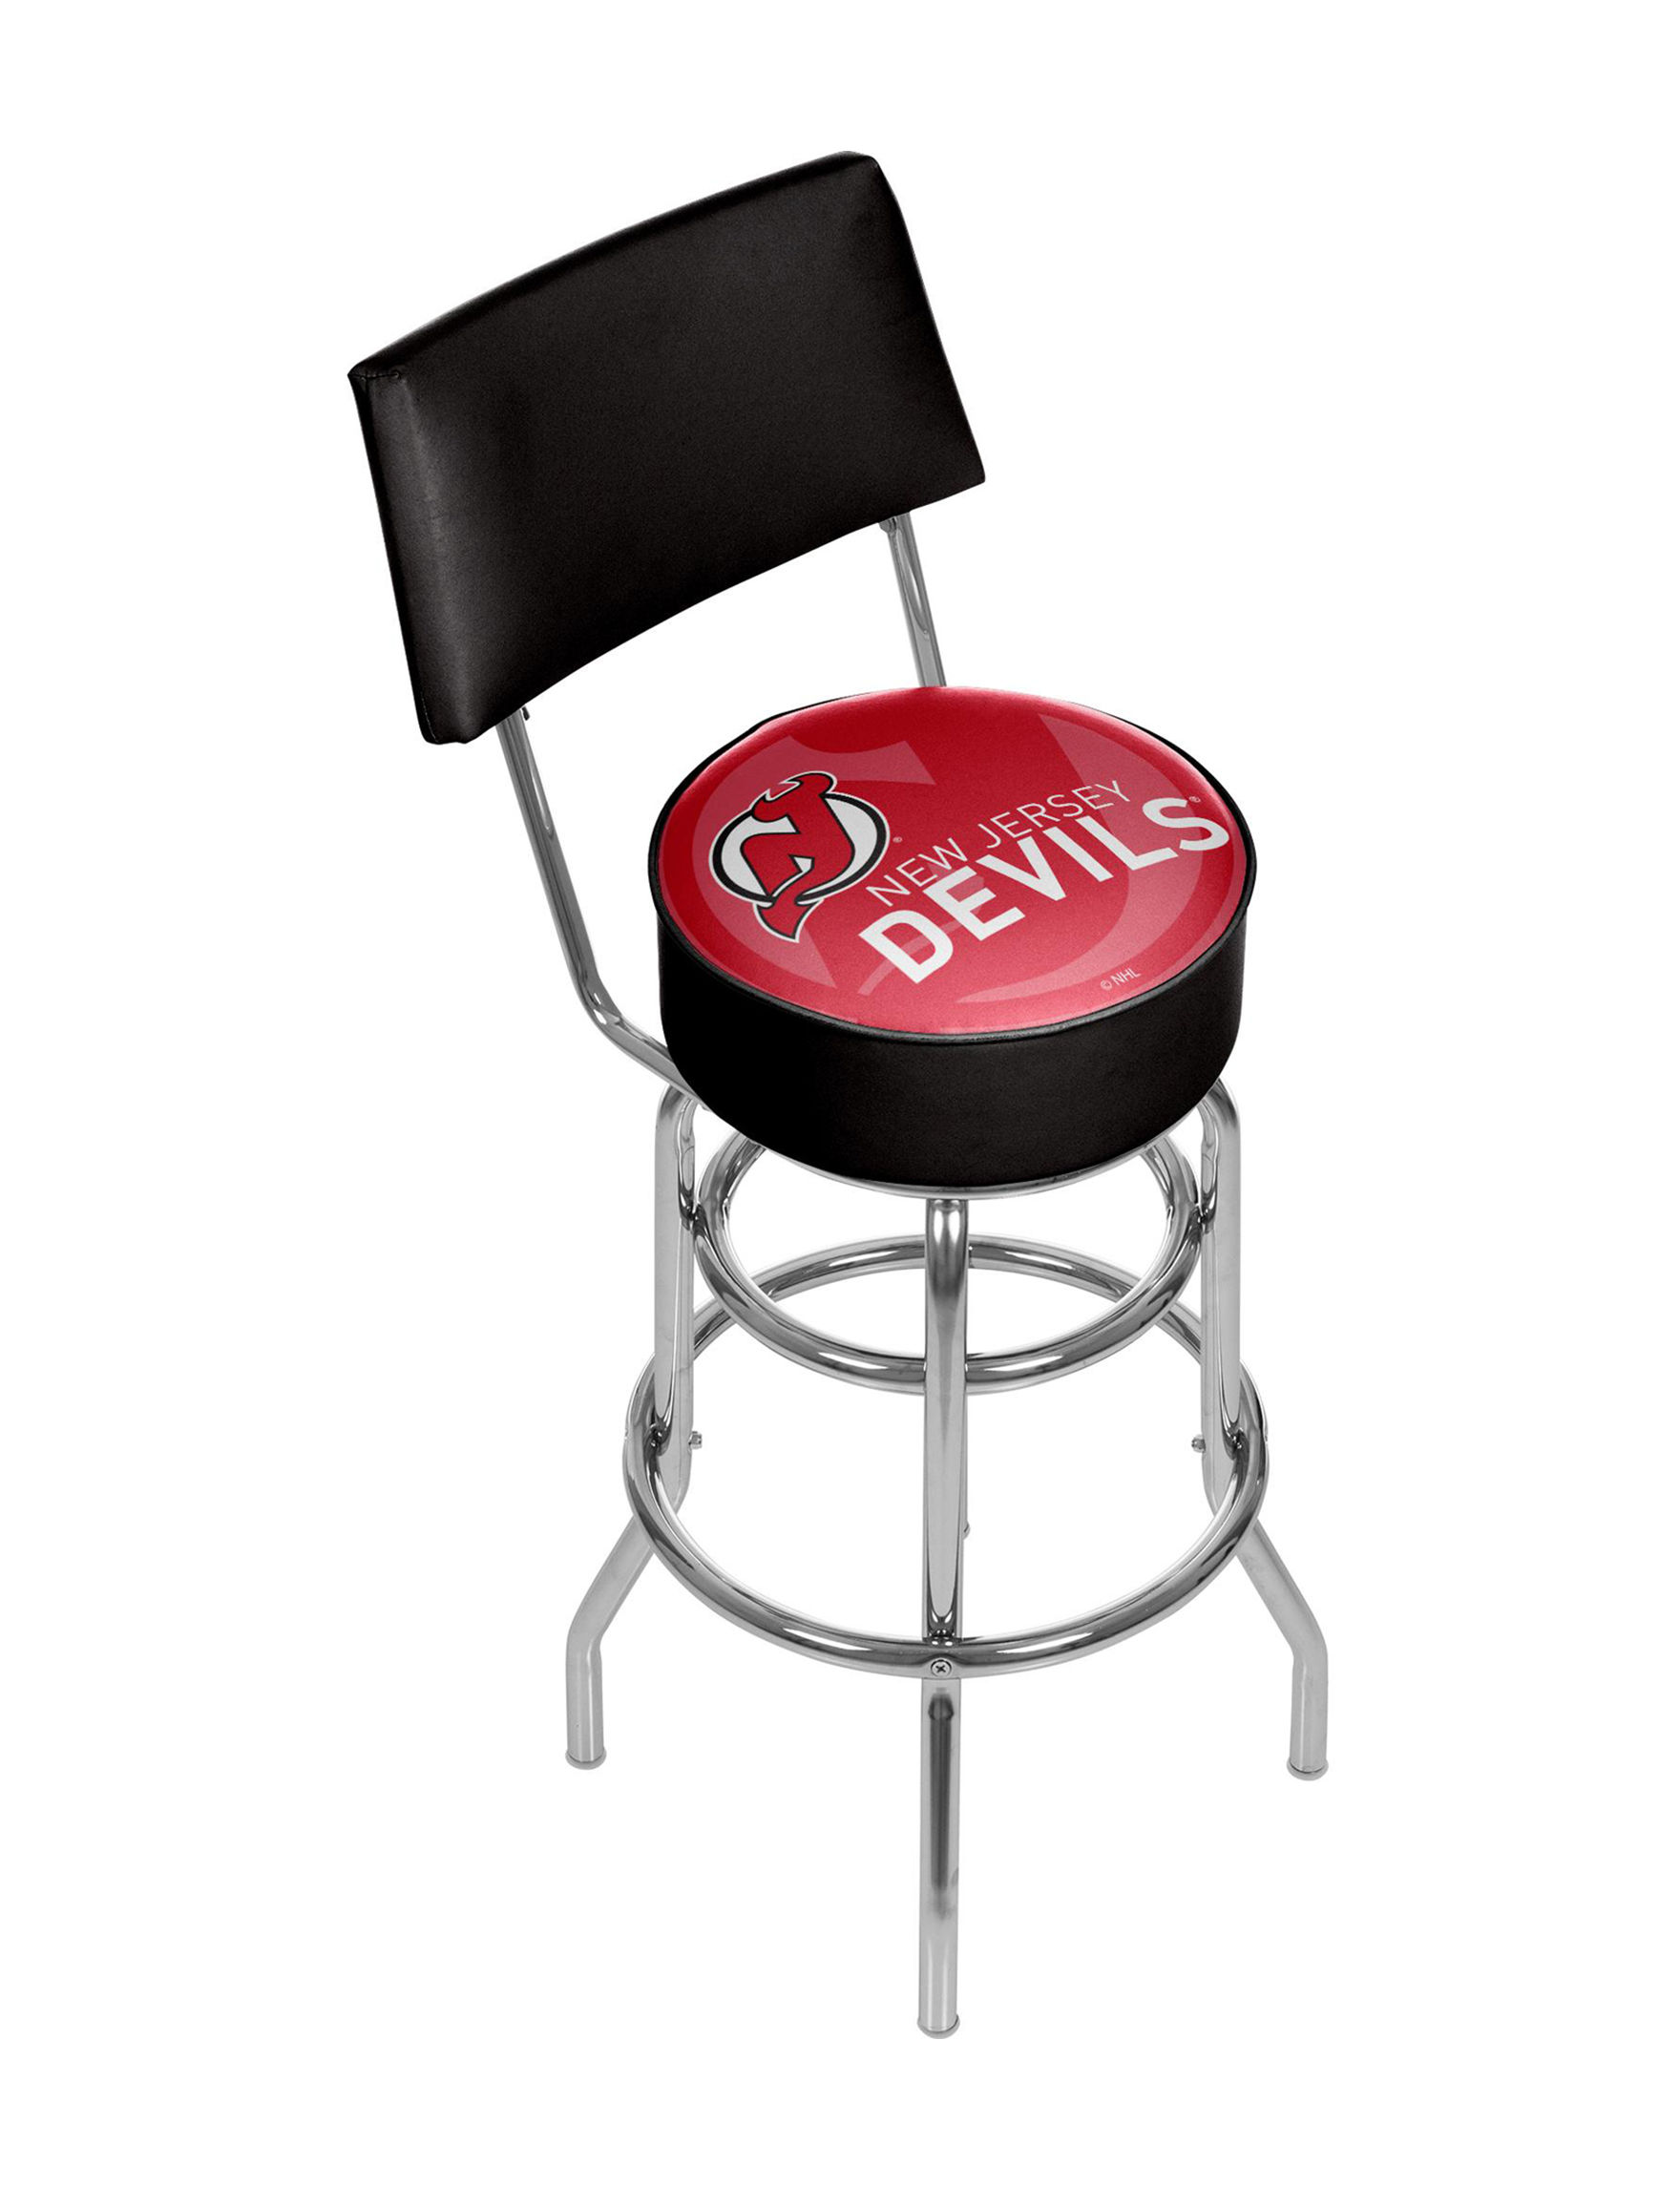 Trademark Global Red / Black / White Bar & Kitchen Stools Game Room Kitchen & Dining Furniture